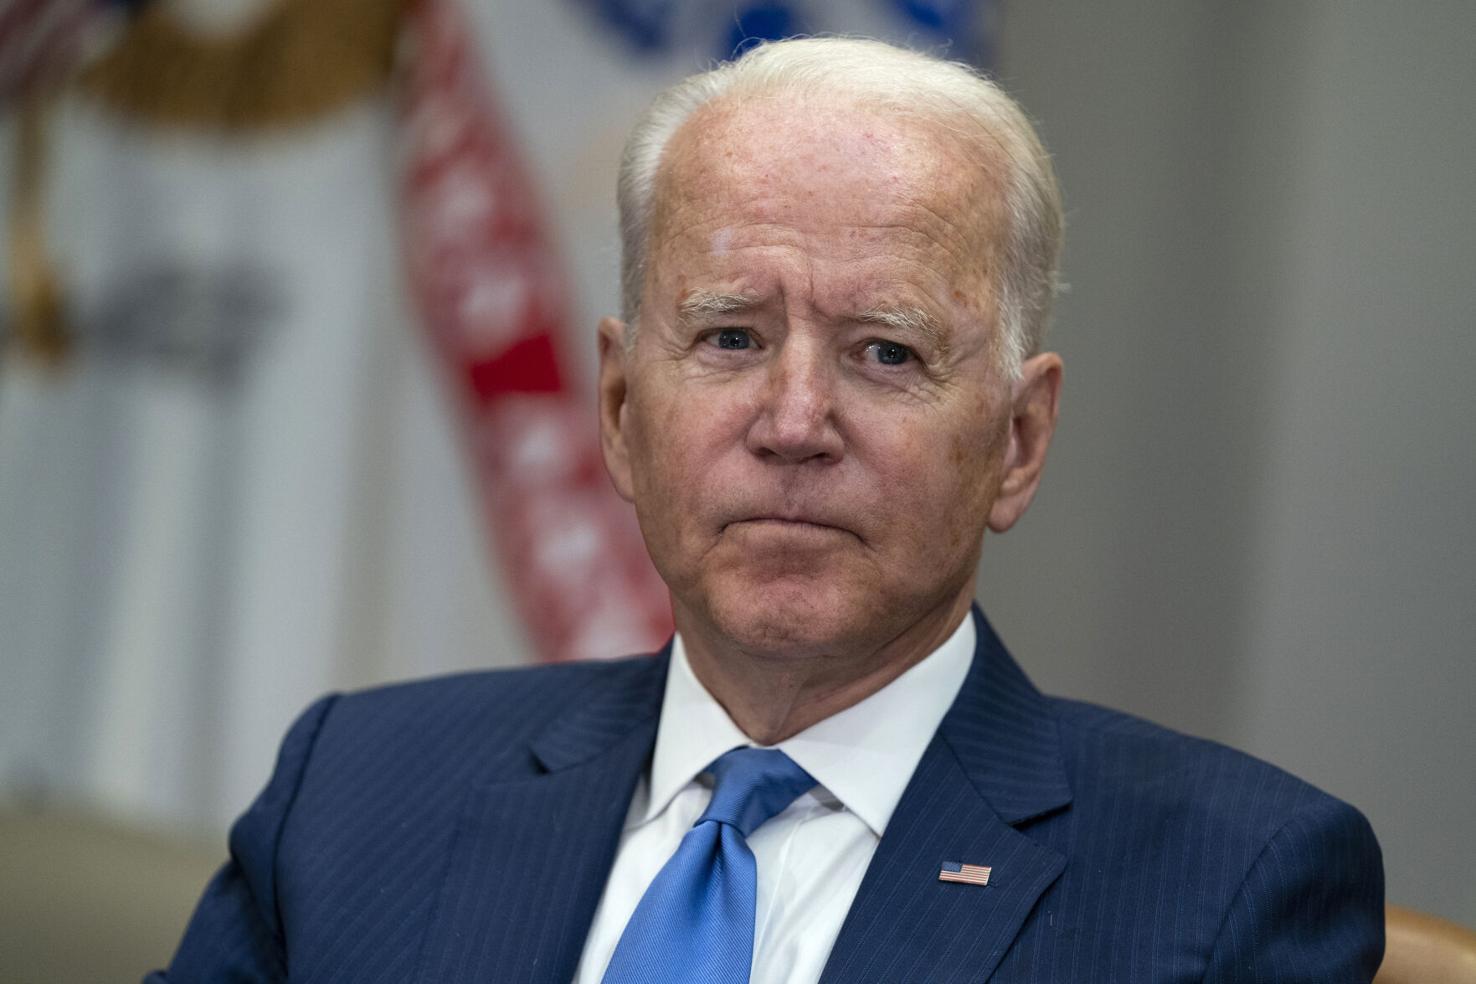 Biden's long-awaited speech on voting; Cuba's 'call for ...